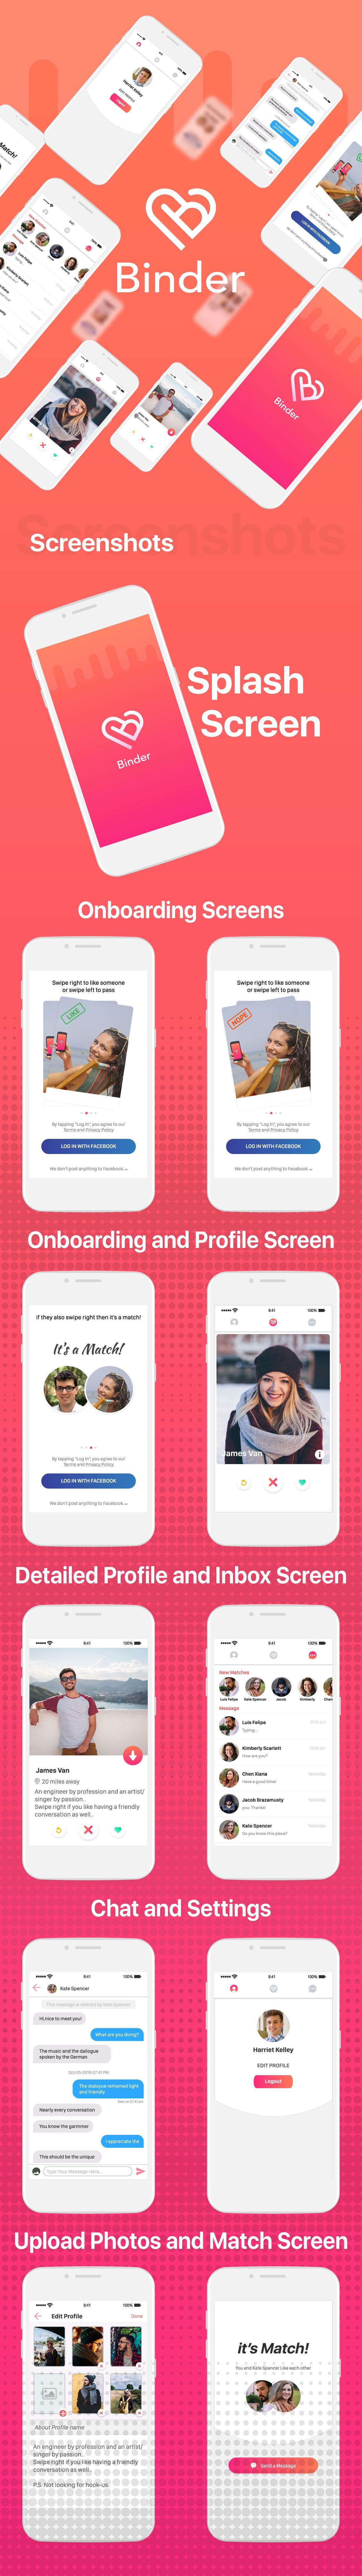 keeper dating app